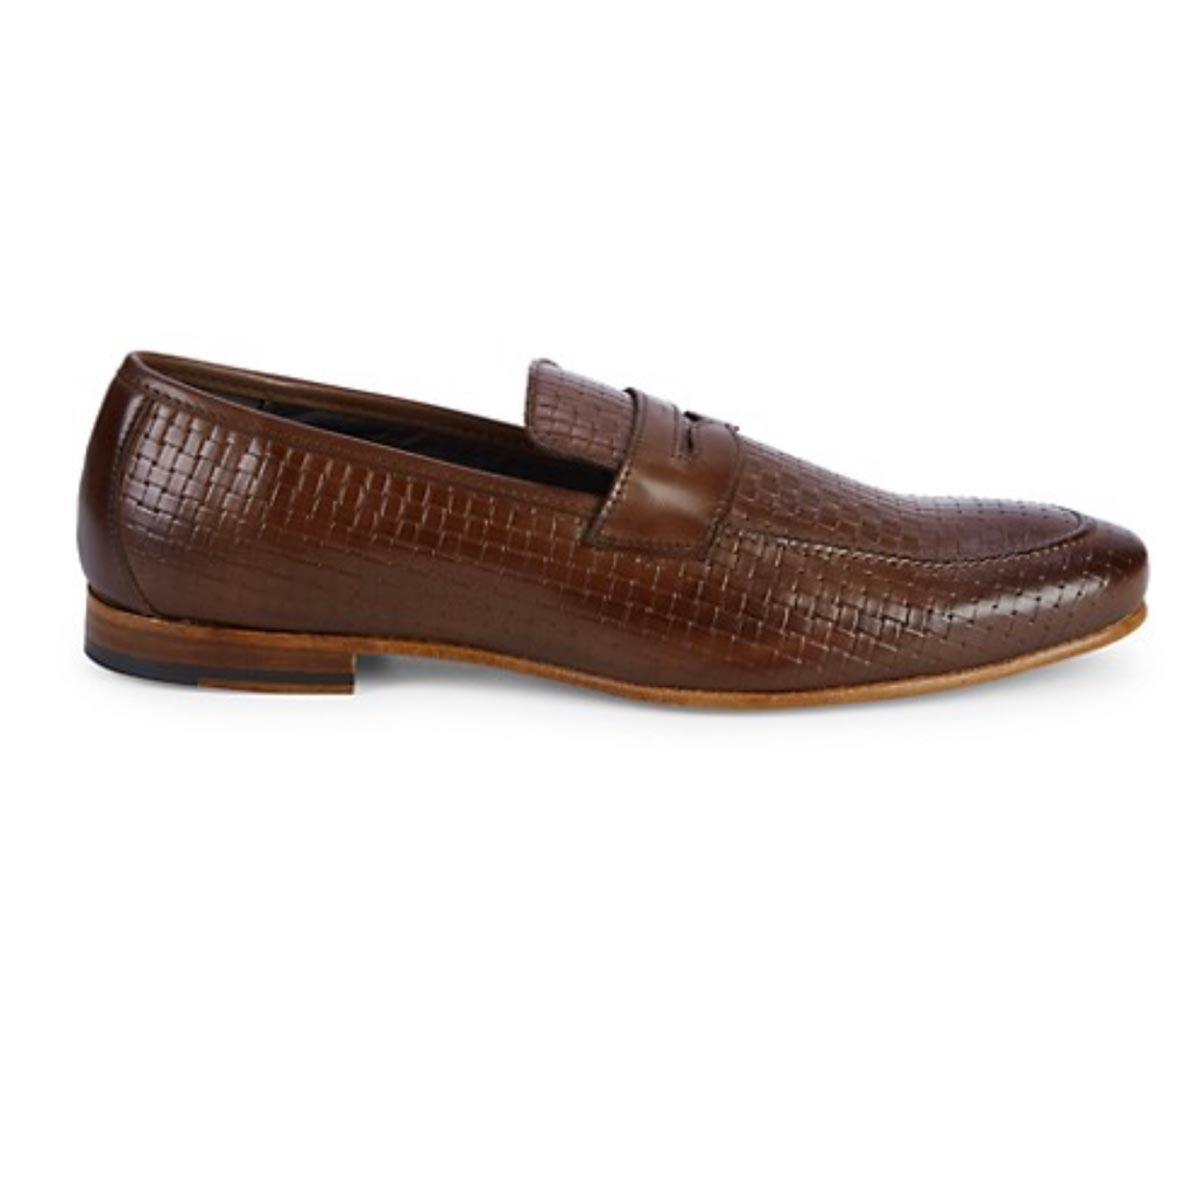 Cognac Leather - Key Largo Penney